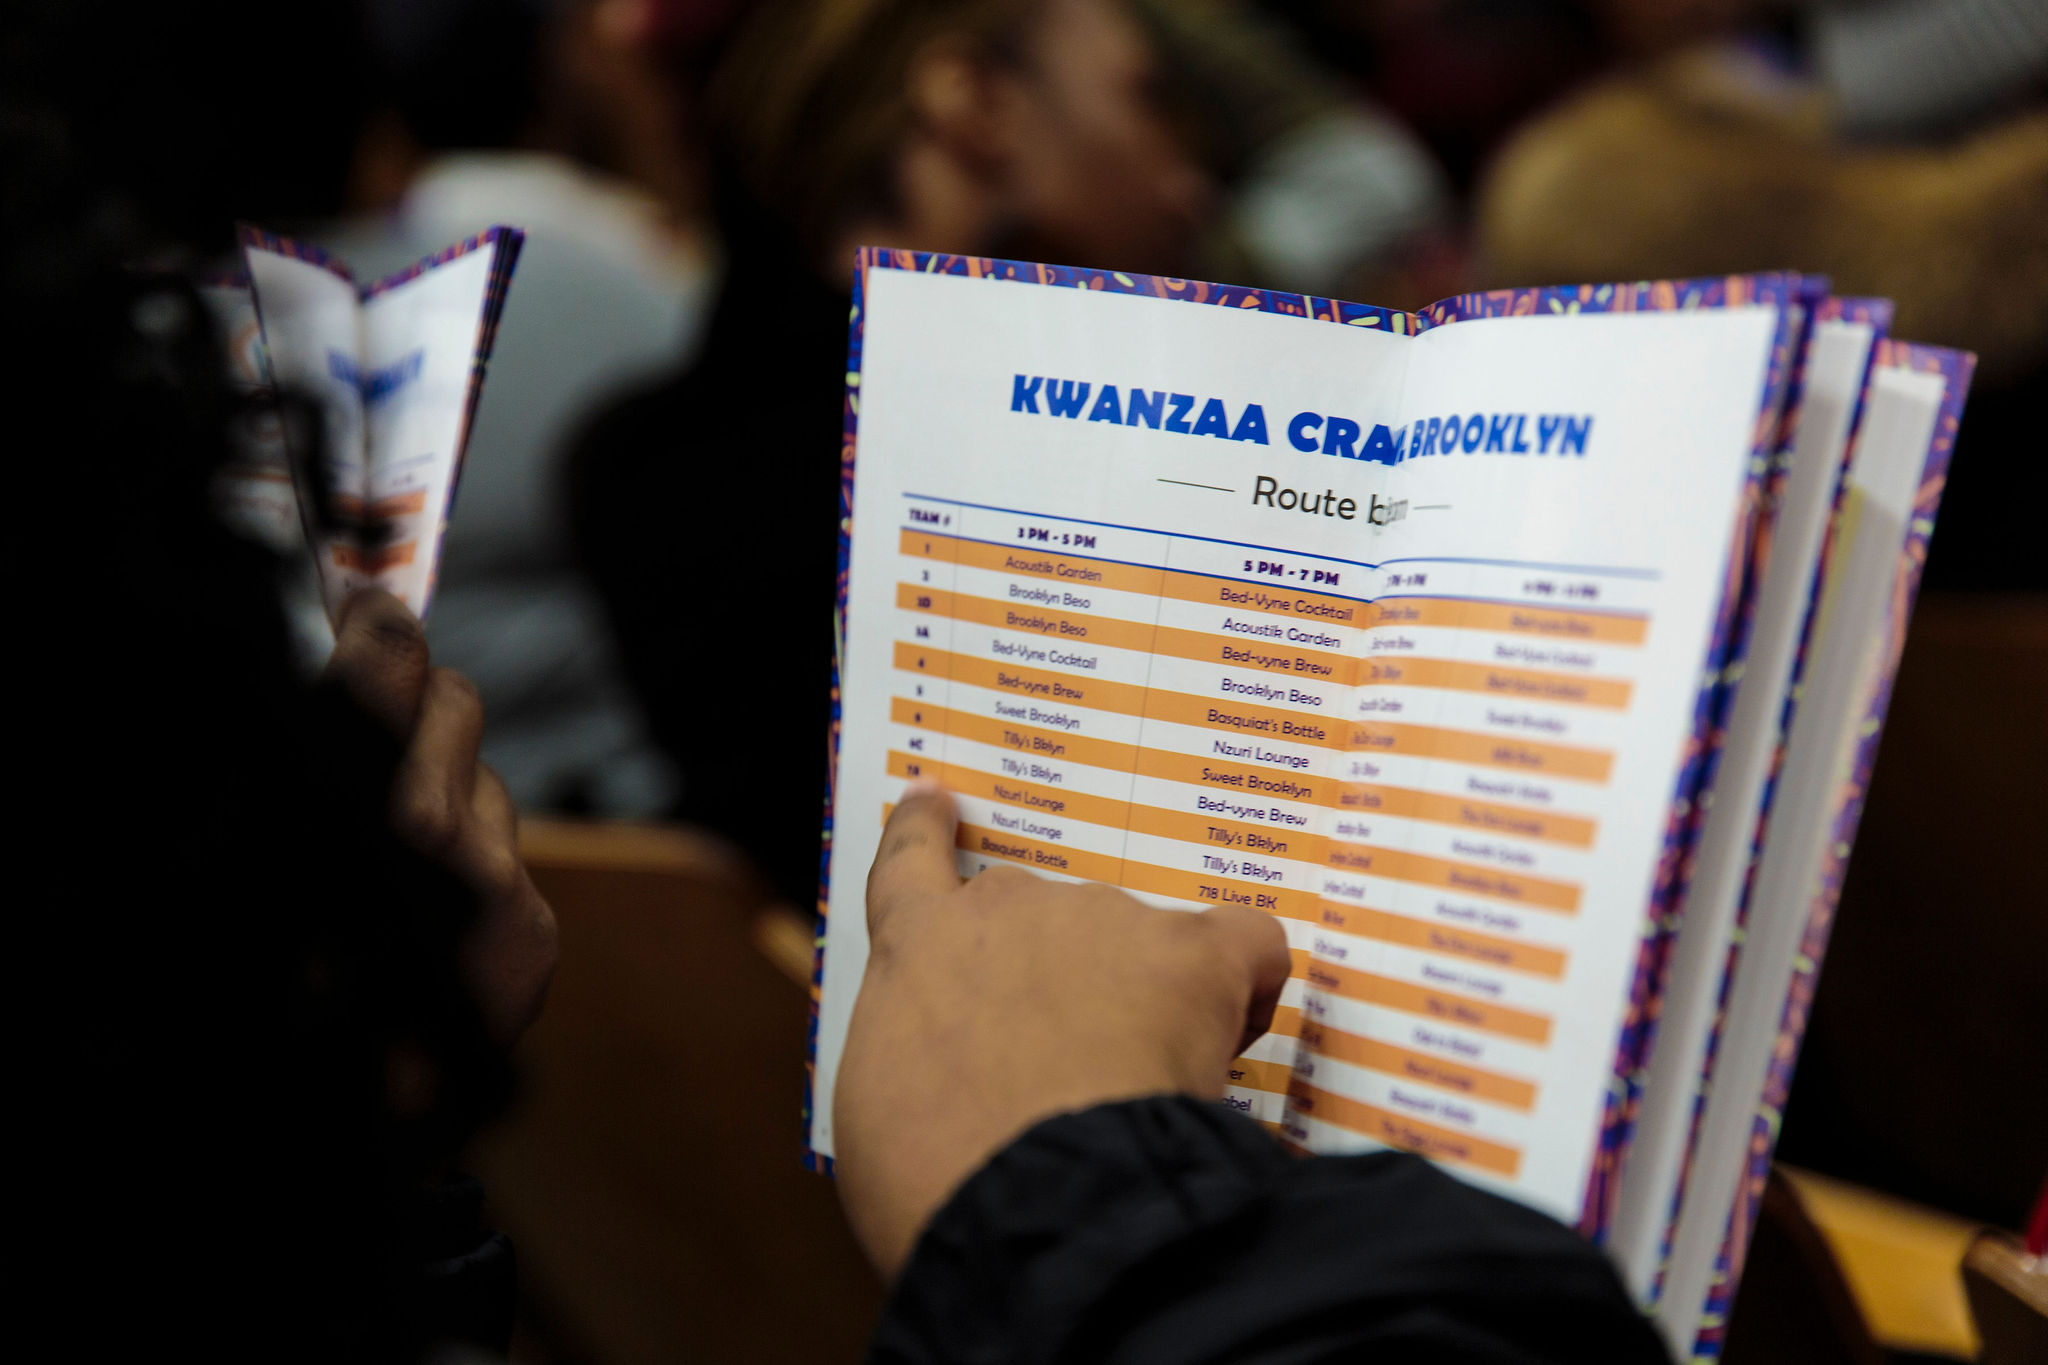 kolinmendezphoto-kwanzaa-crawl-bknyc-2018.12.26-35-9246.jpg